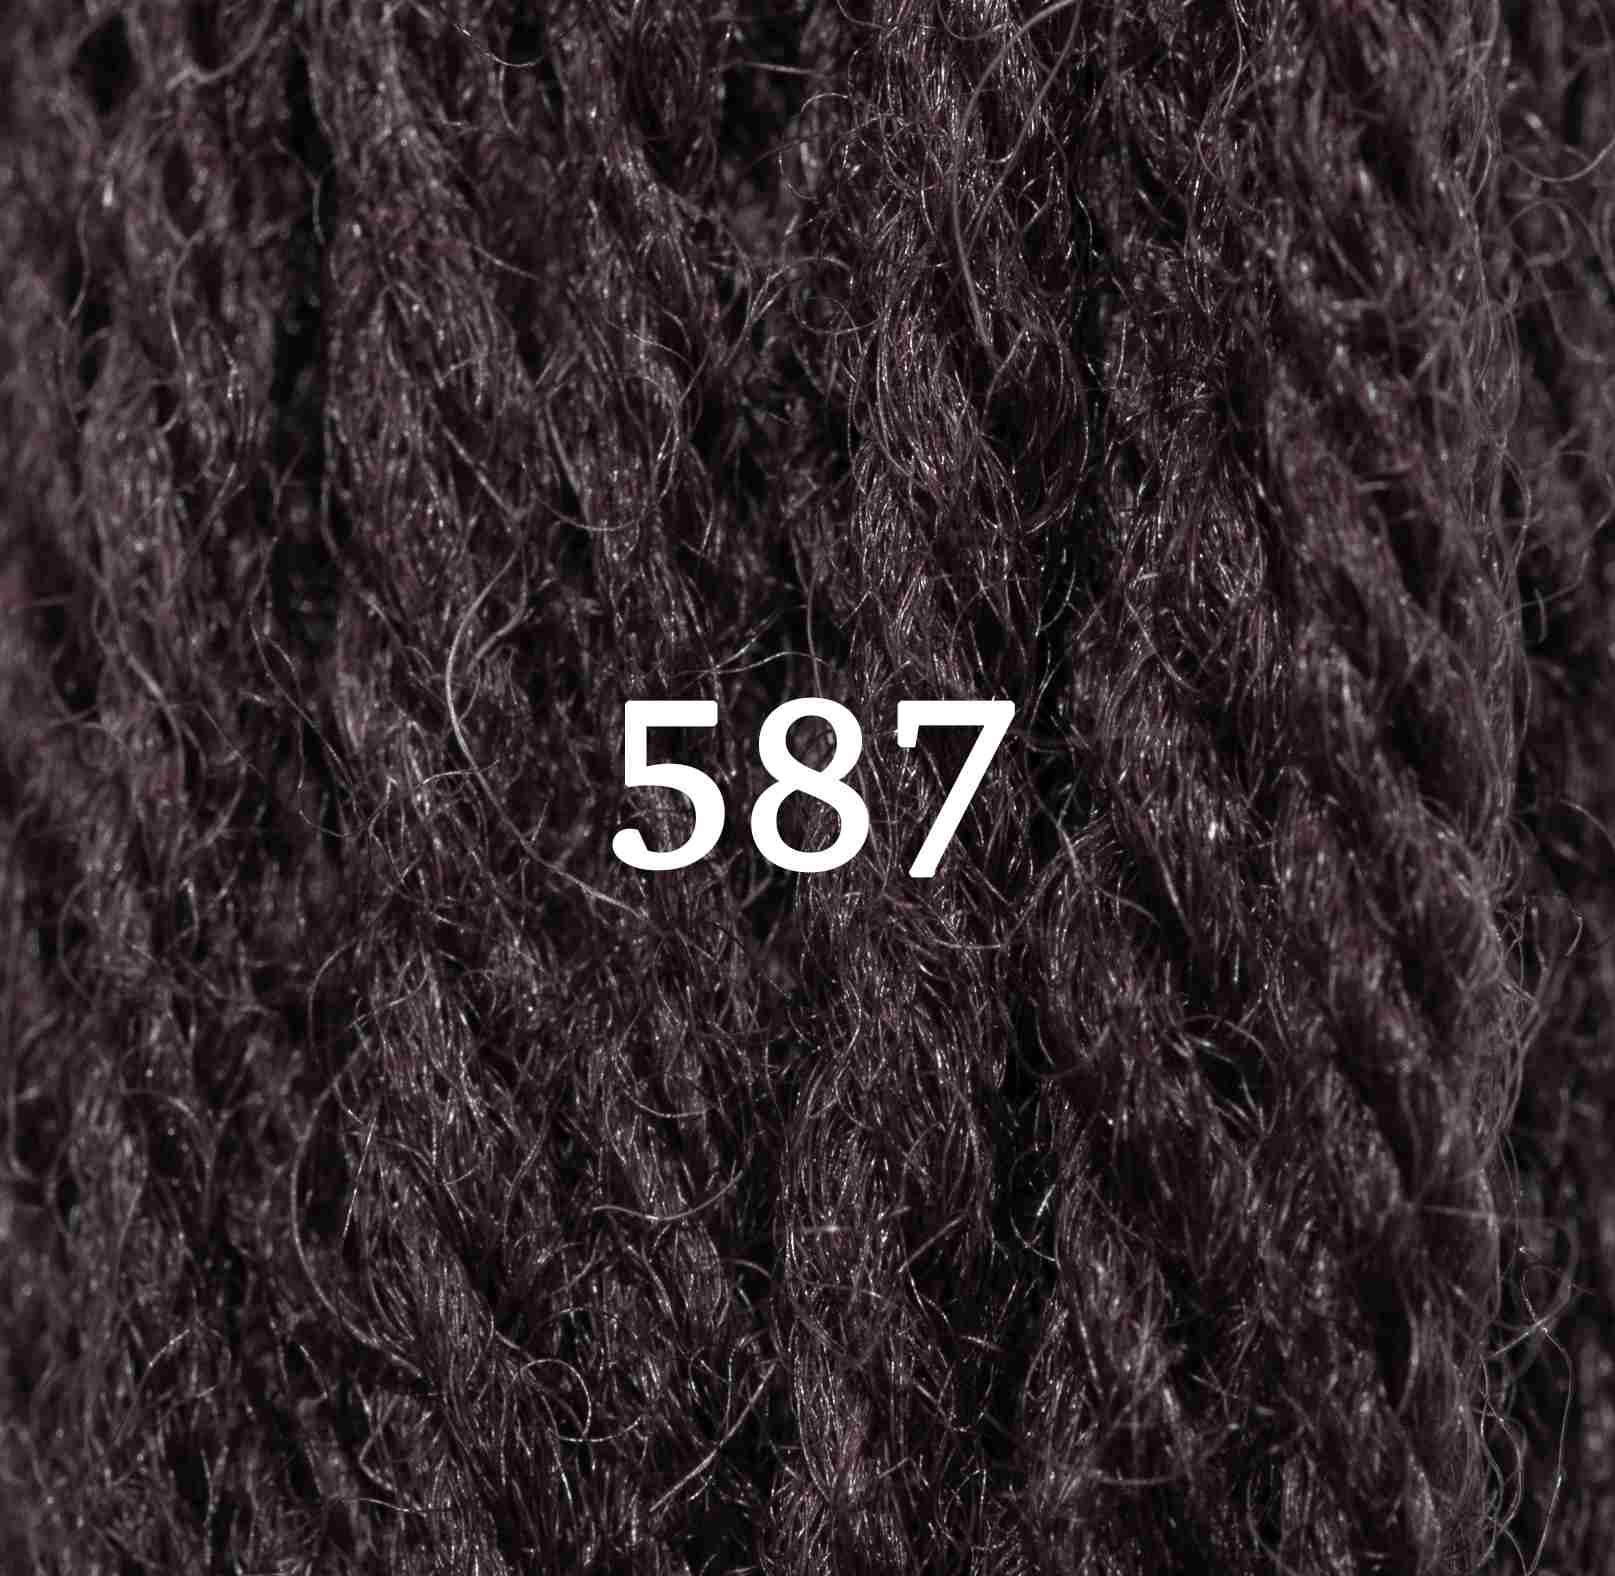 Brown-Groundings-587